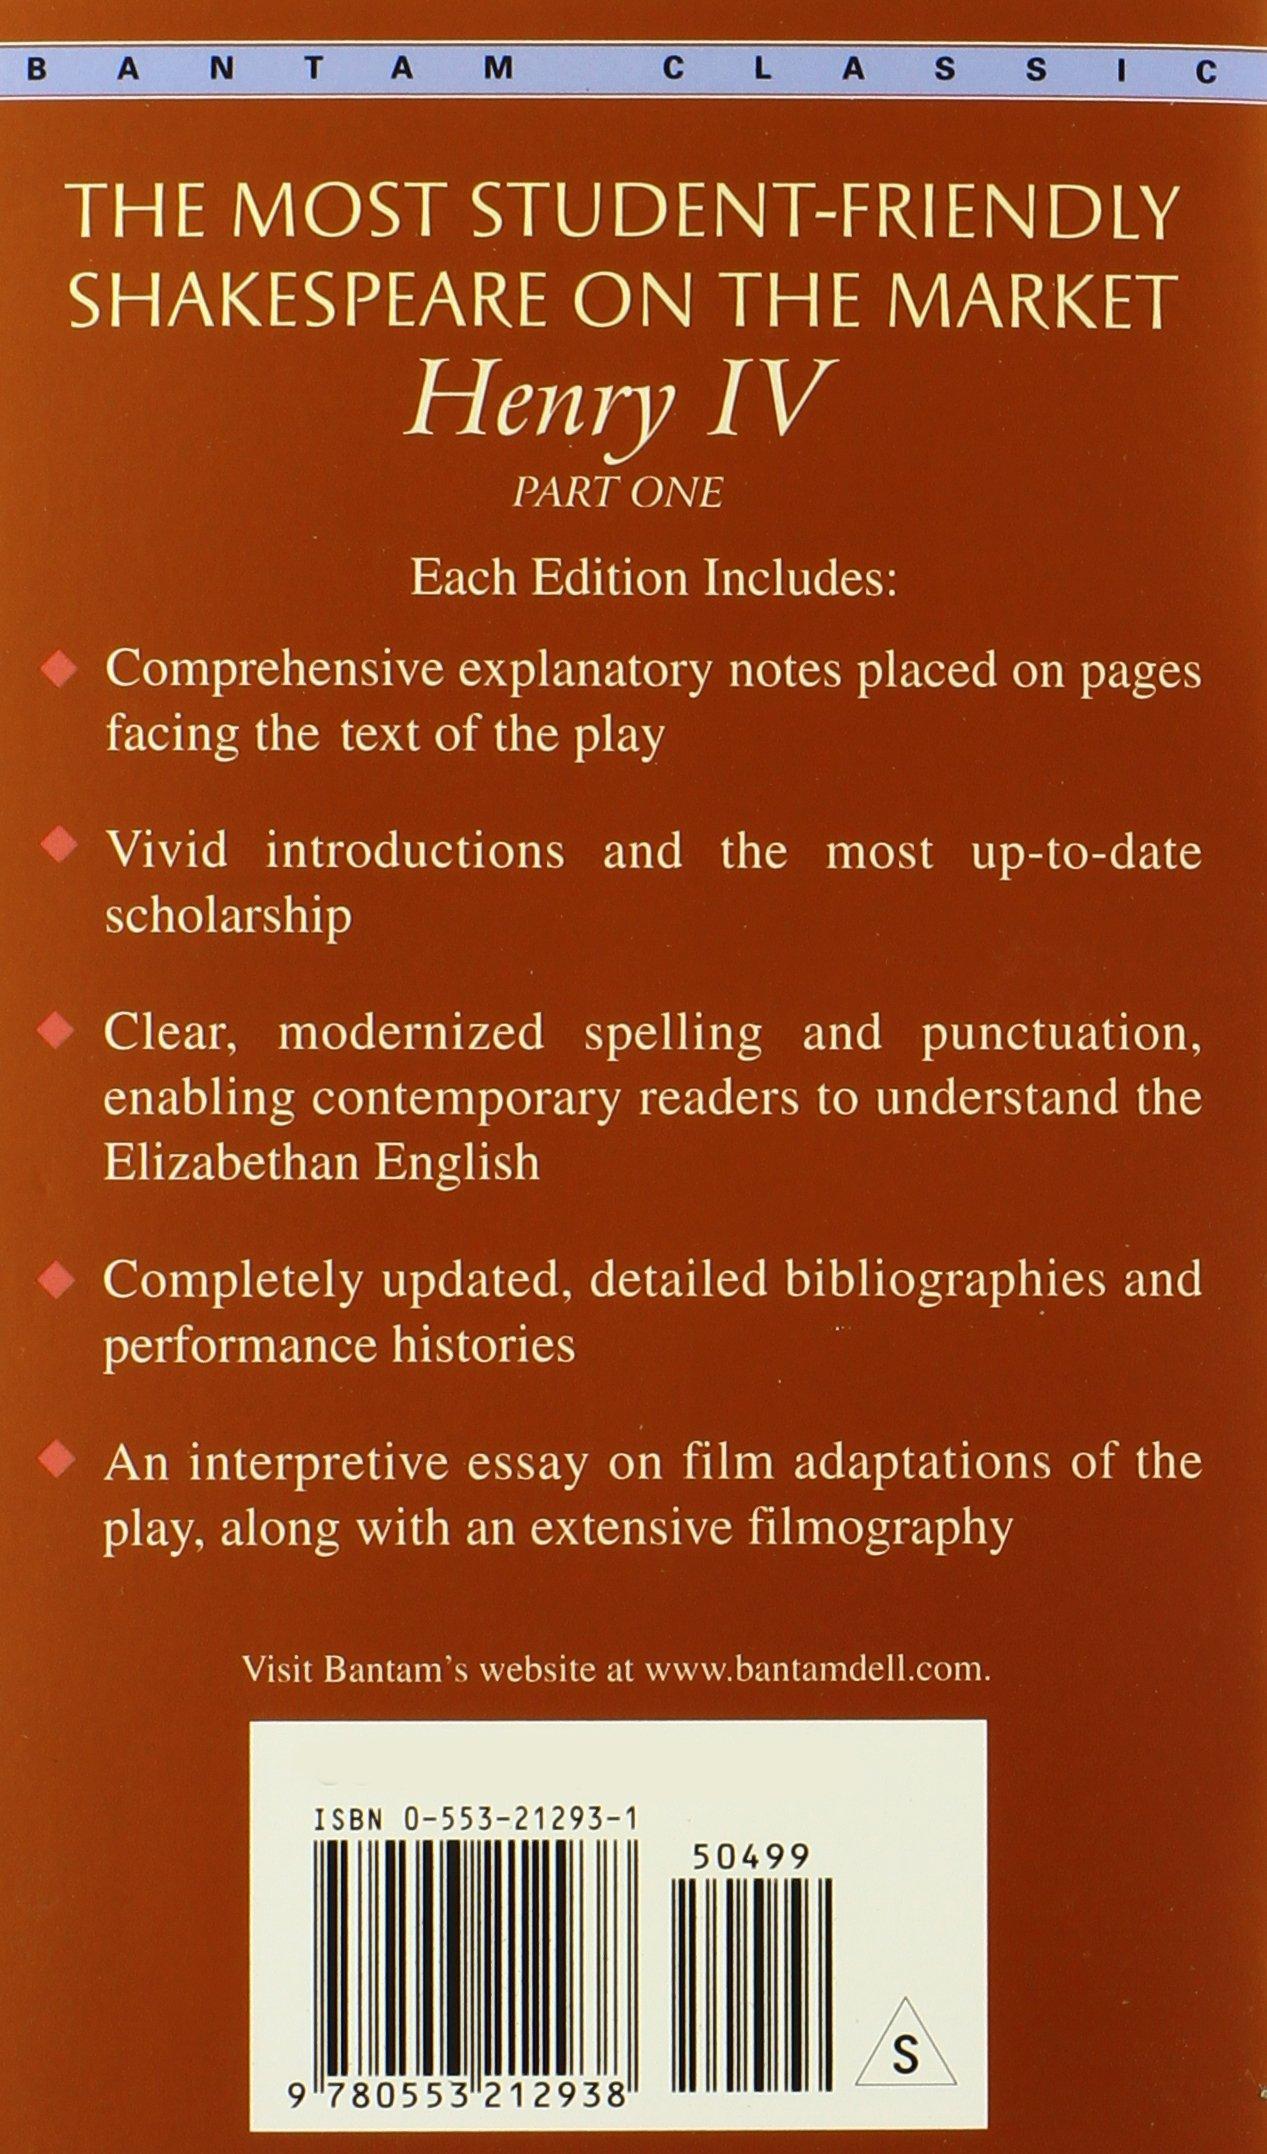 Buy non plagiarized essays